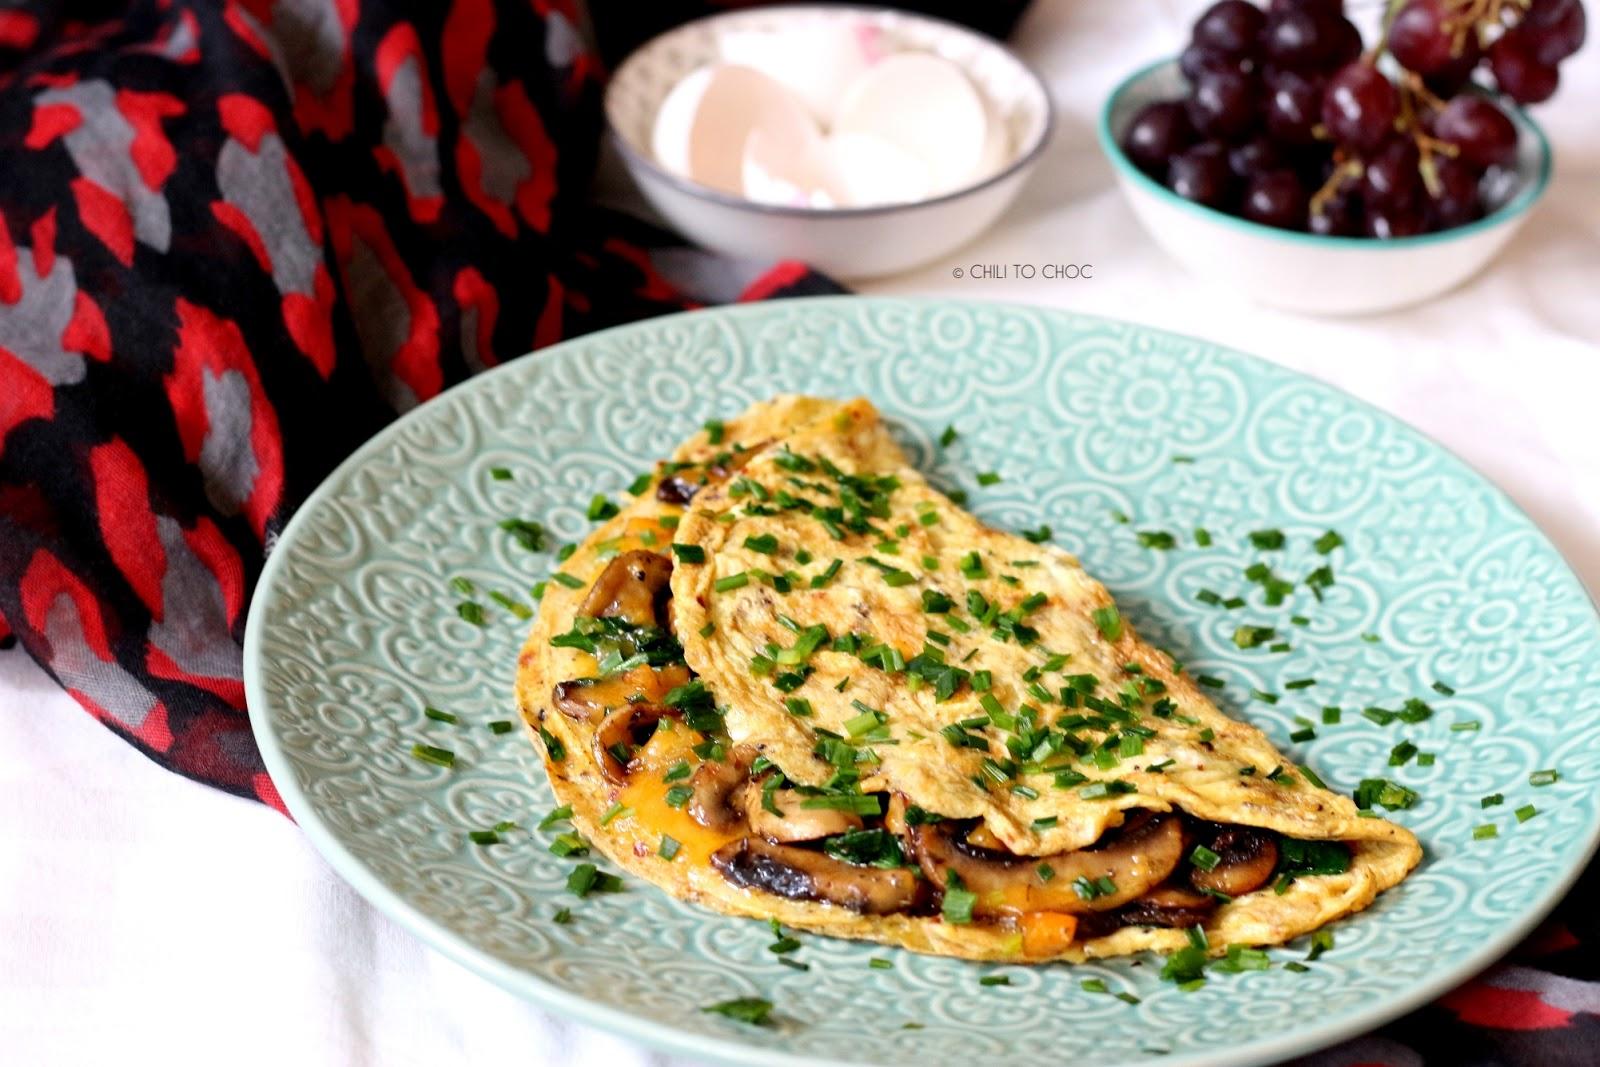 Cheesy Mushroom-Stuffed Omelet